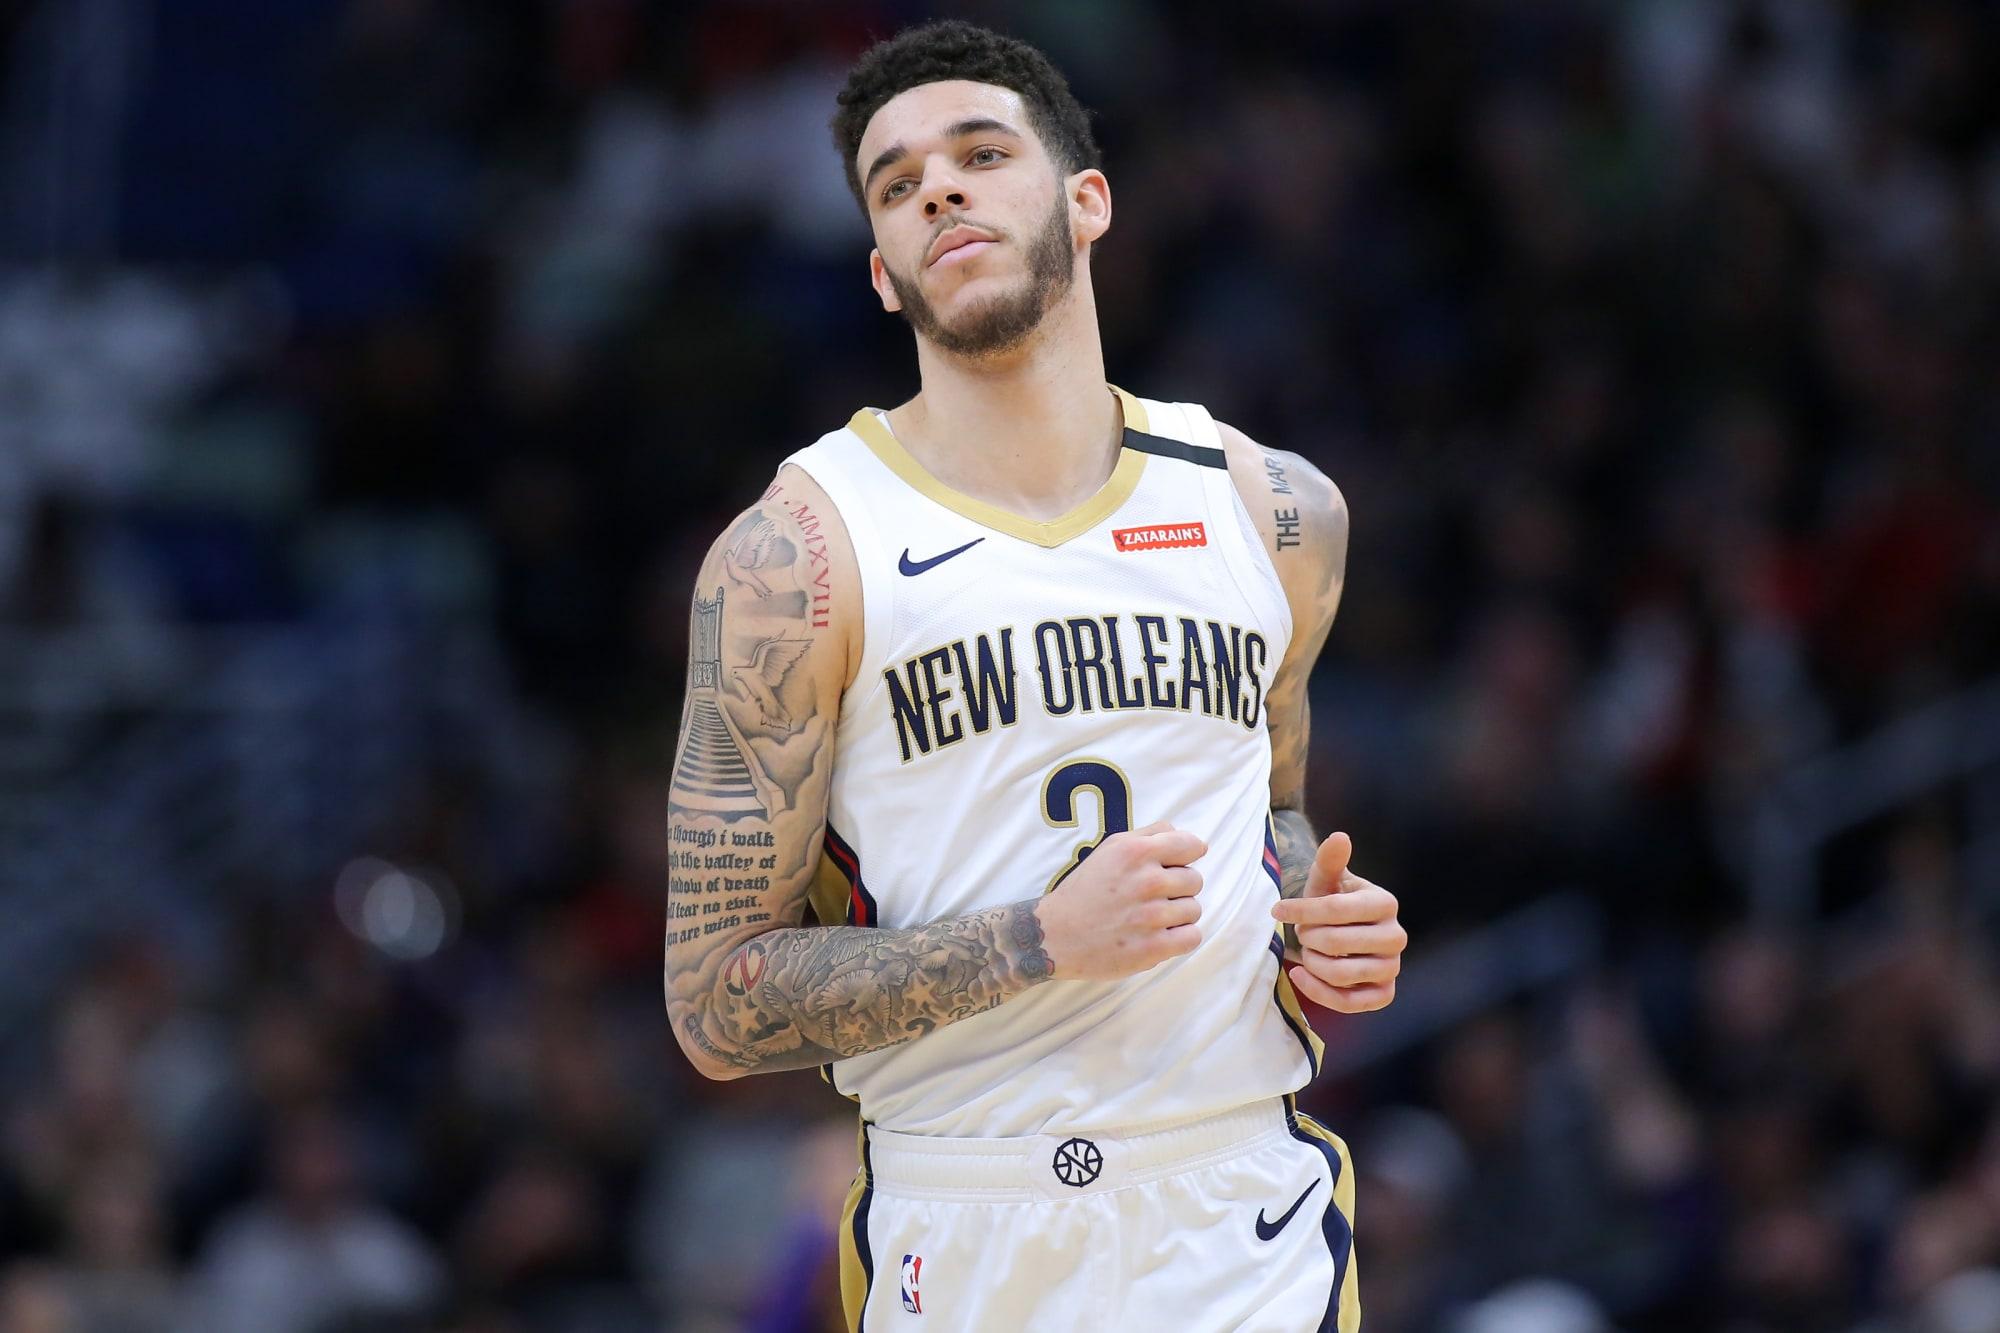 Boston Celtics: What point guards should Cs target this off-season?